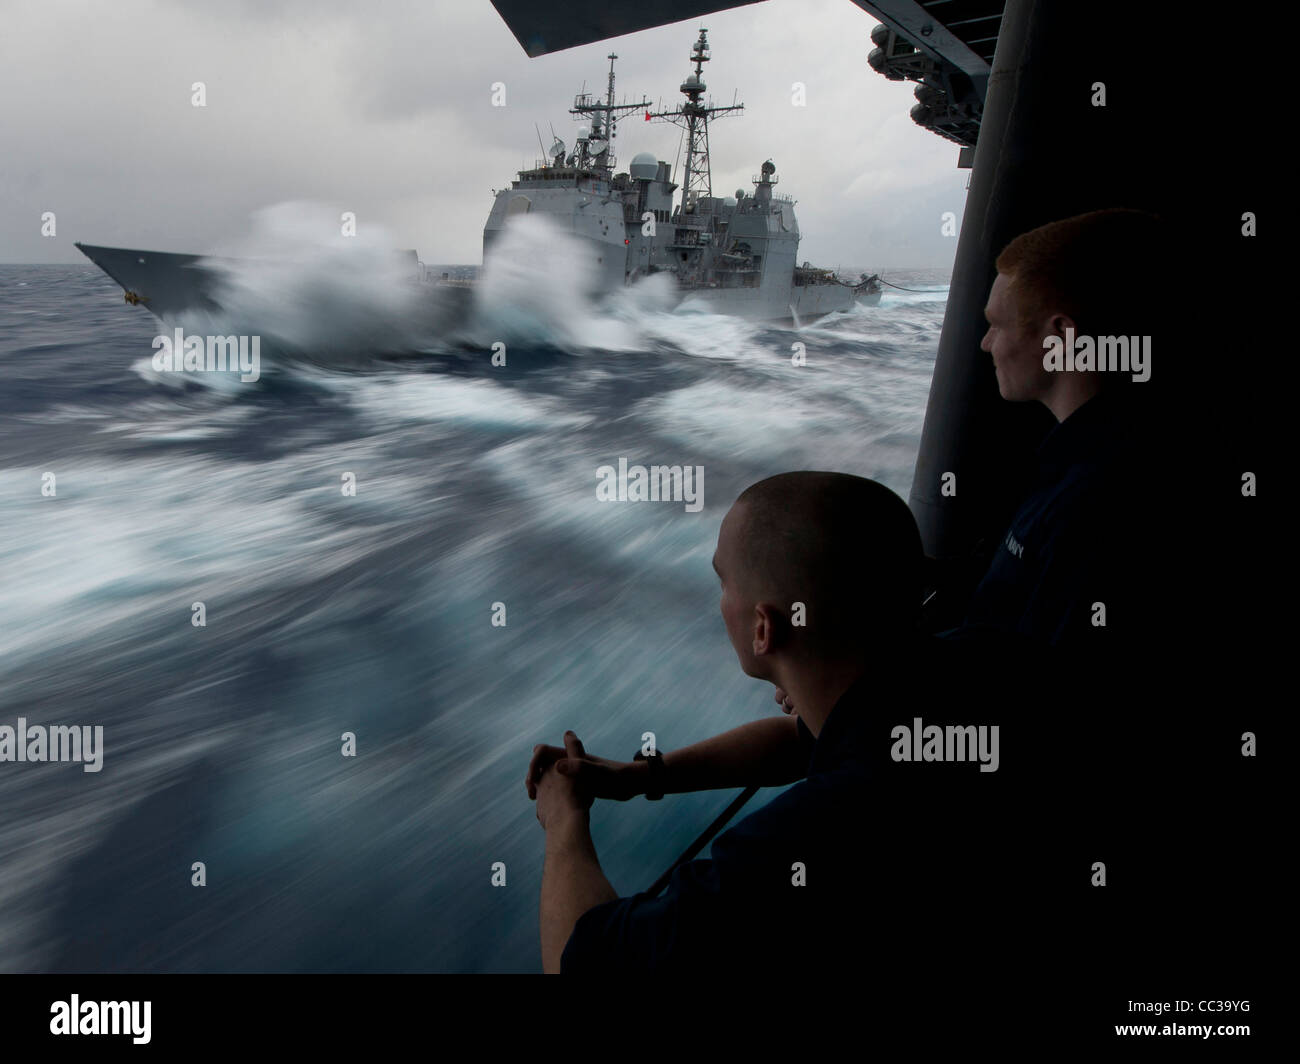 Guiado de clase Ticonderoga-crucero de misiles USS Bunker Hill (CG 52) tomar combustible en mar gruesa durante un Foto de stock